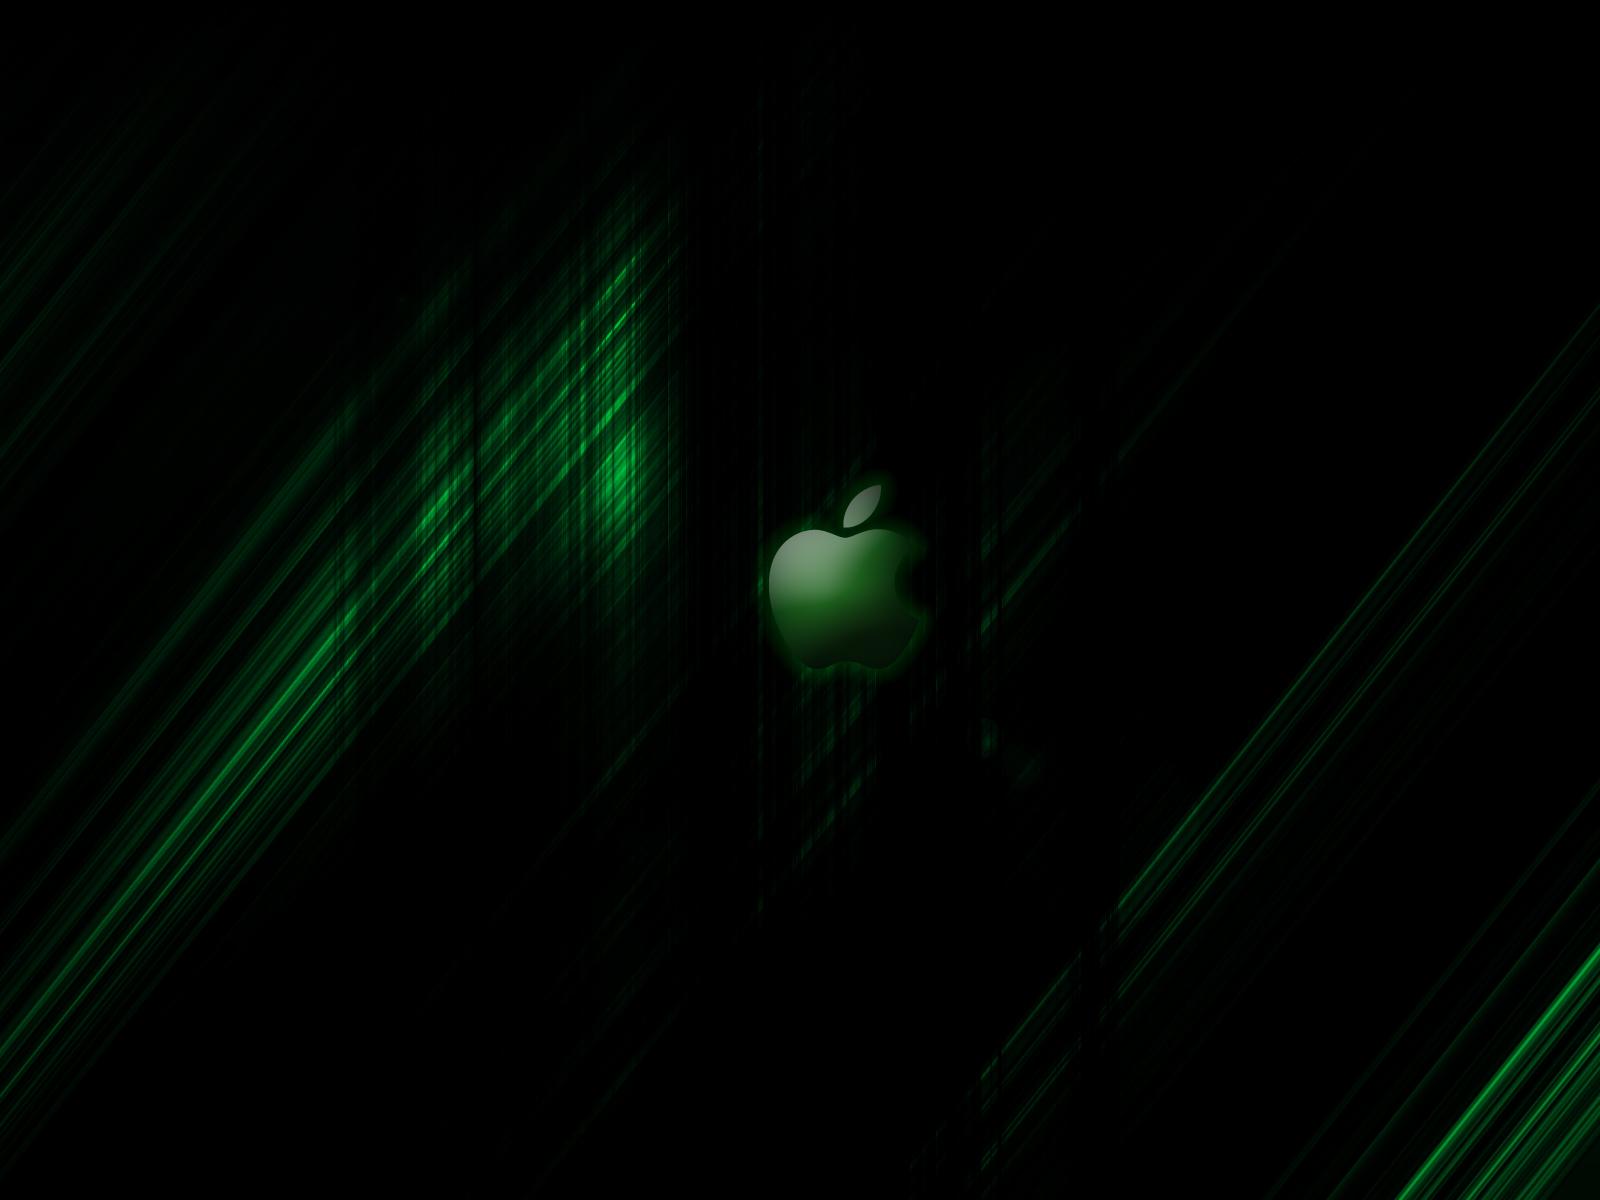 Apple Sfondo And Sfondi 1600x1200 Id463284 Wallpaper Abyss